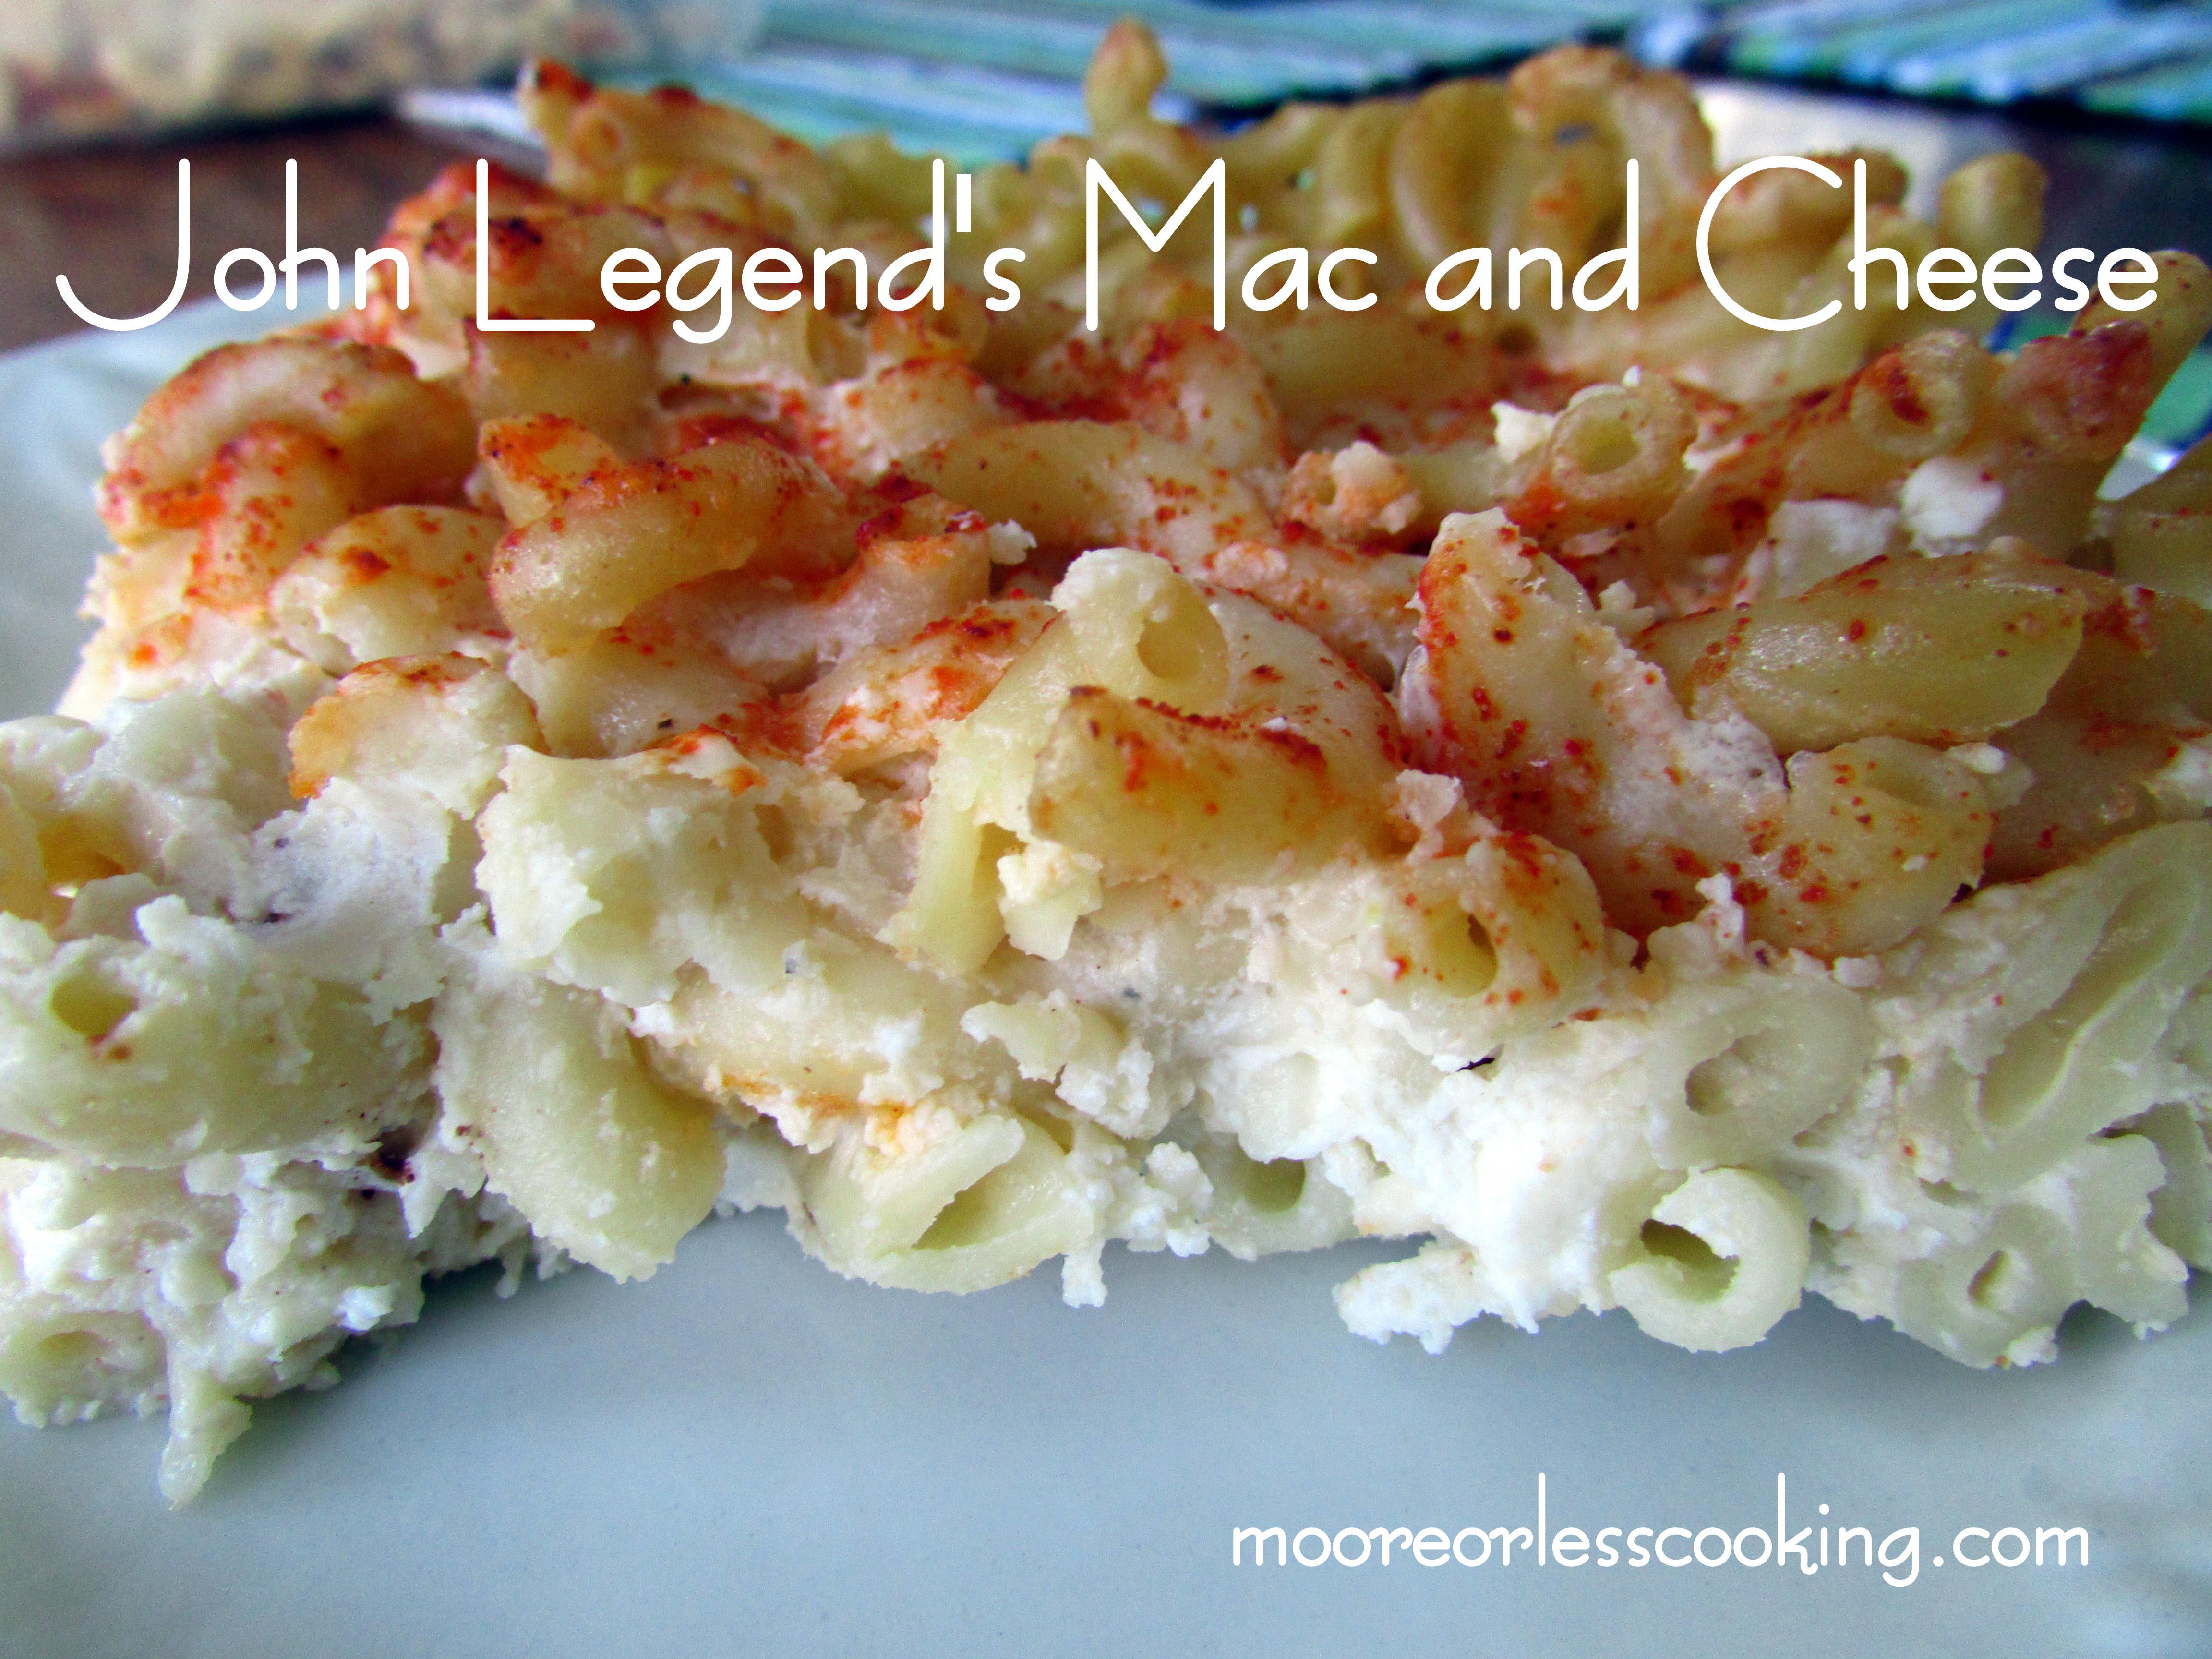 John Legend's Mac and Cheese